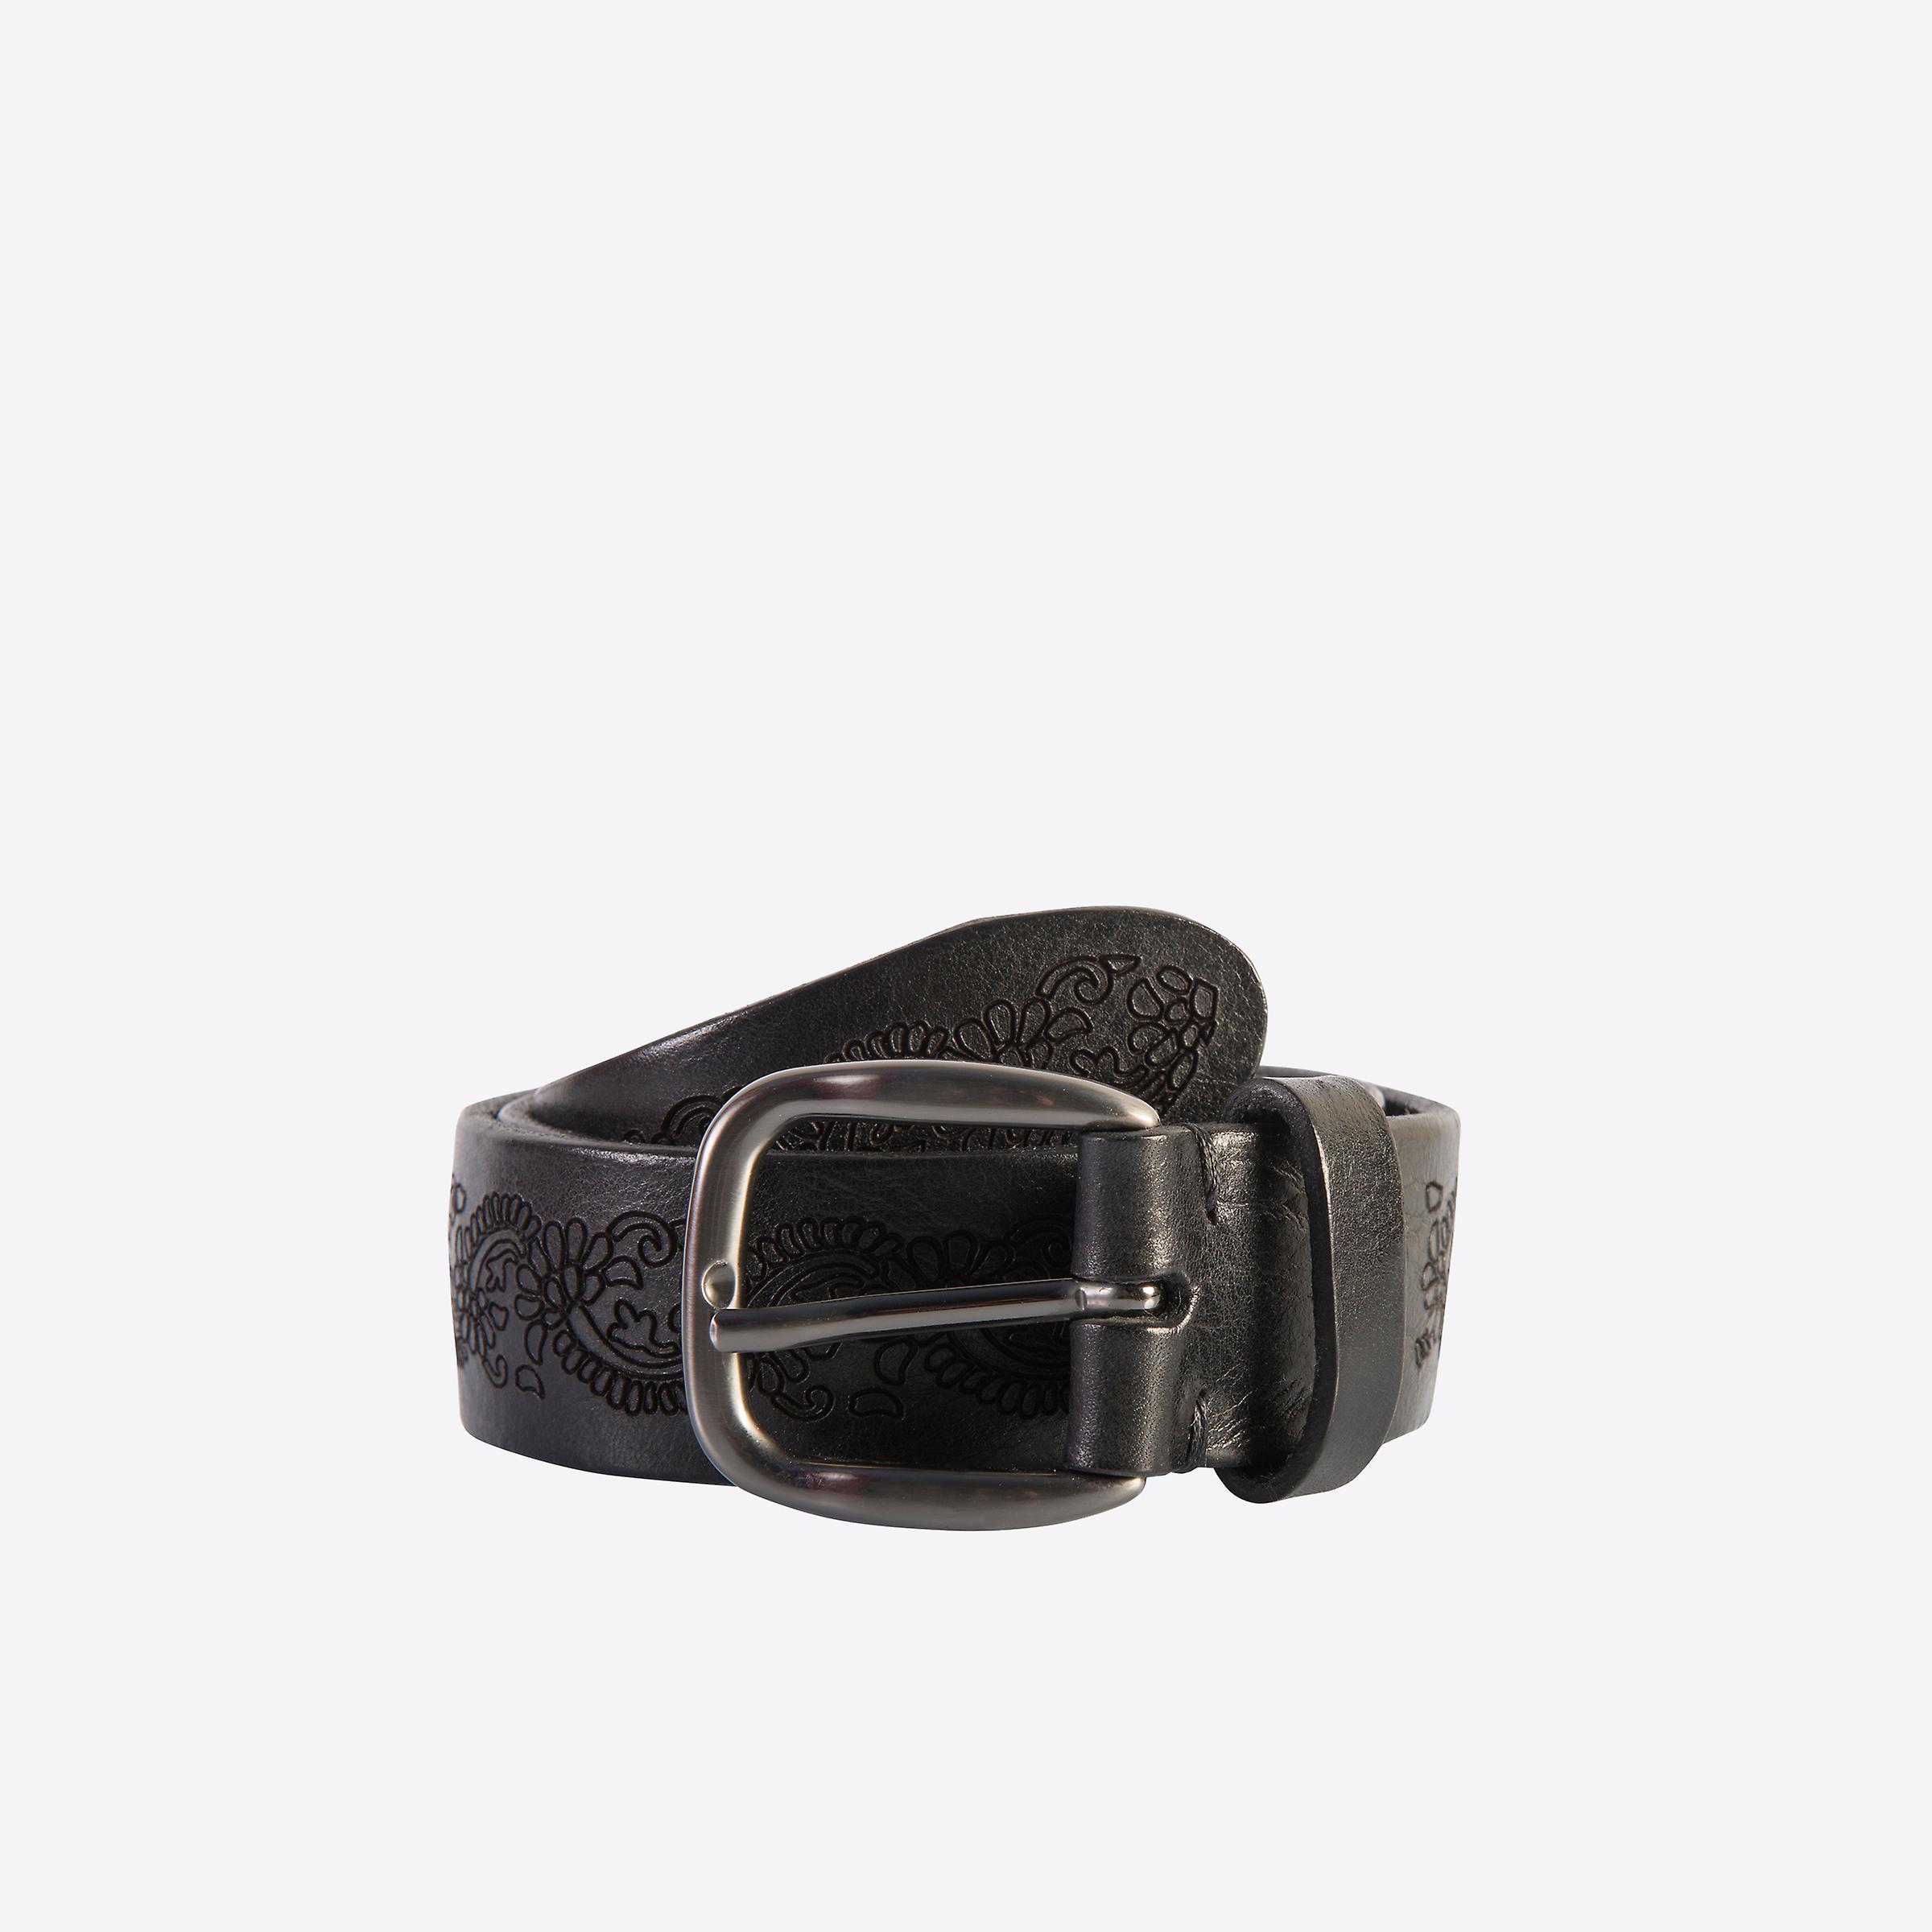 Fabio Giovanni Mantano Belt - High Quality Floral Leather Belt